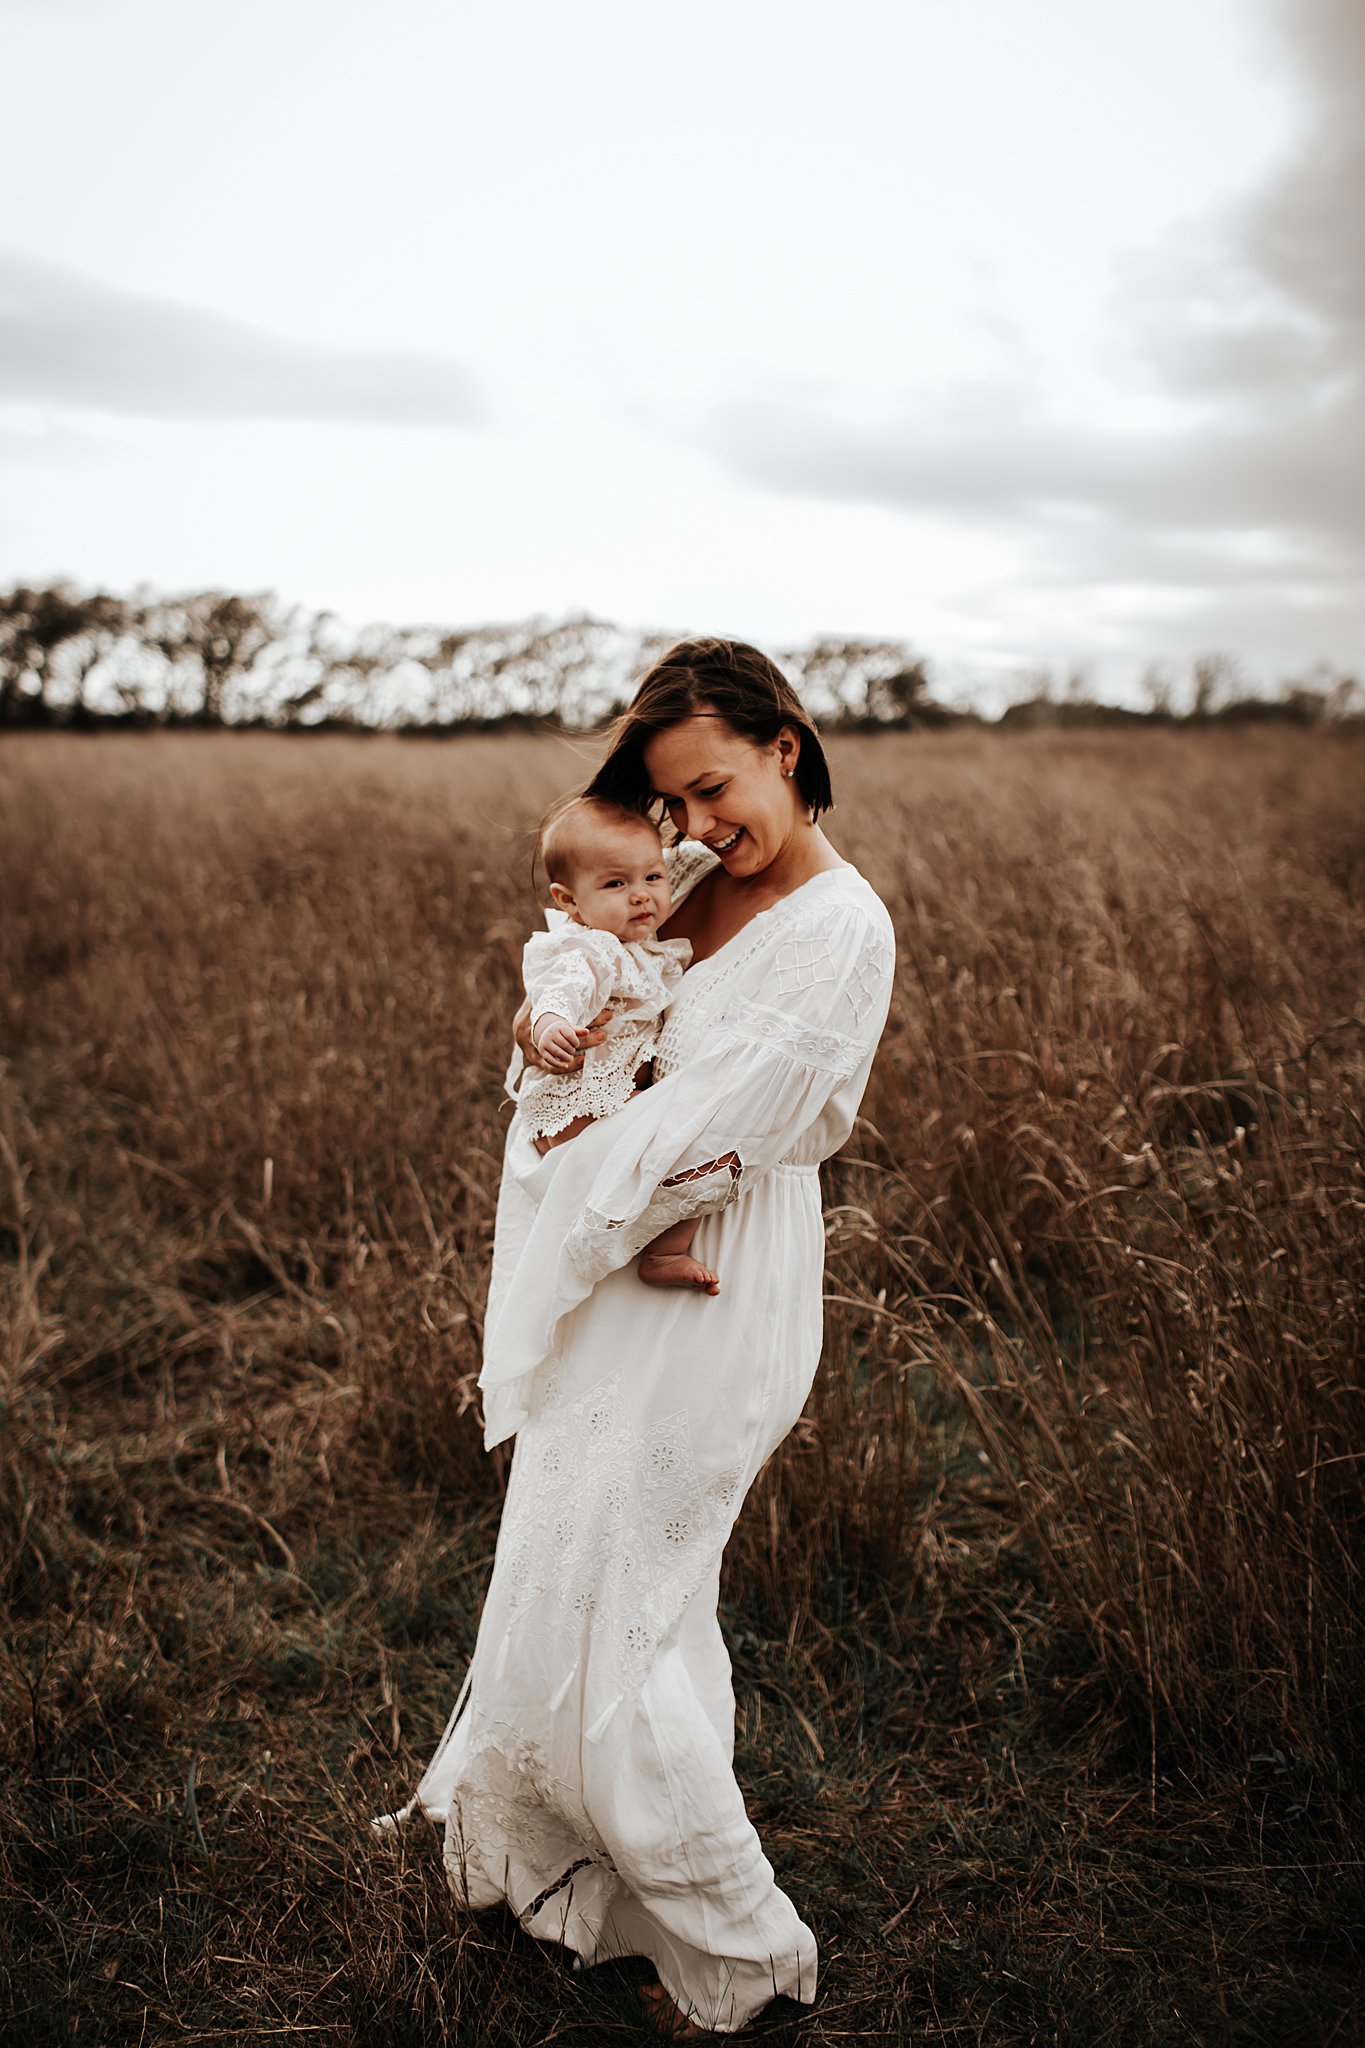 Shelby-San-Antonio-Family-Photographer-30_WEB.jpg